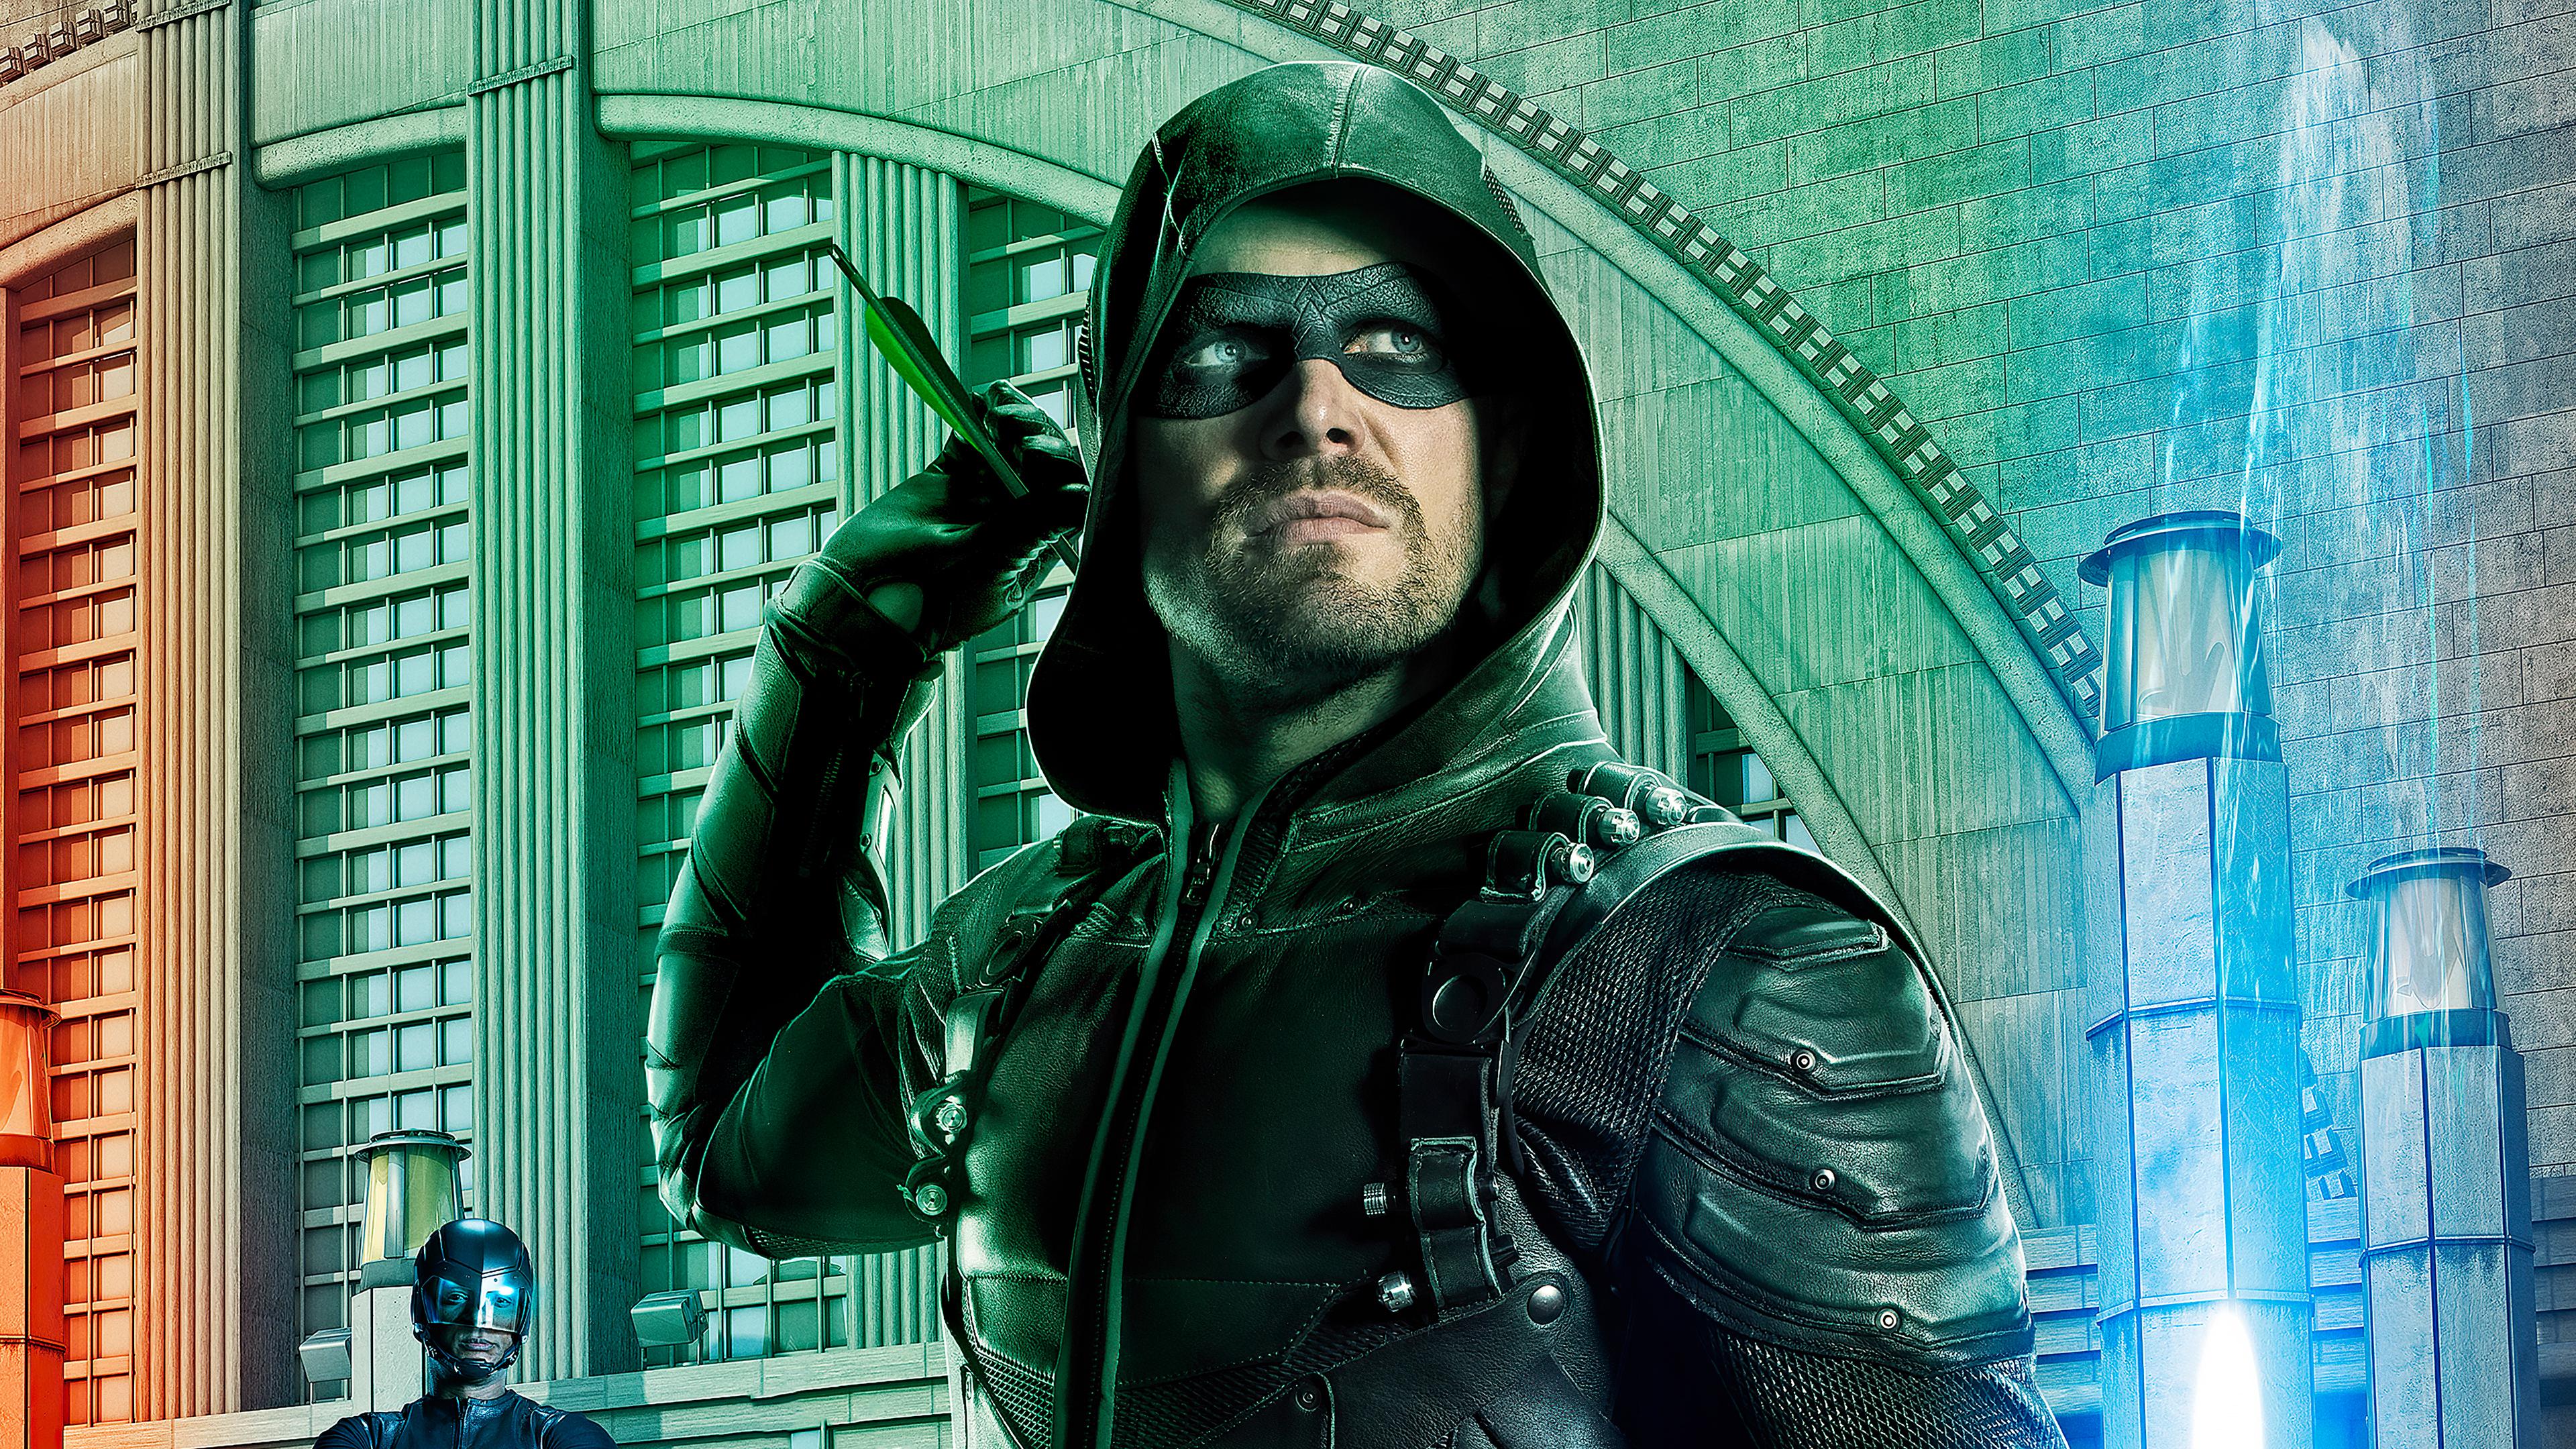 arrow season 5 poster 4k 1615201769 - Arrow Season 5 Poster 4k - Arrow Season 5 Poster 4k wallpapers